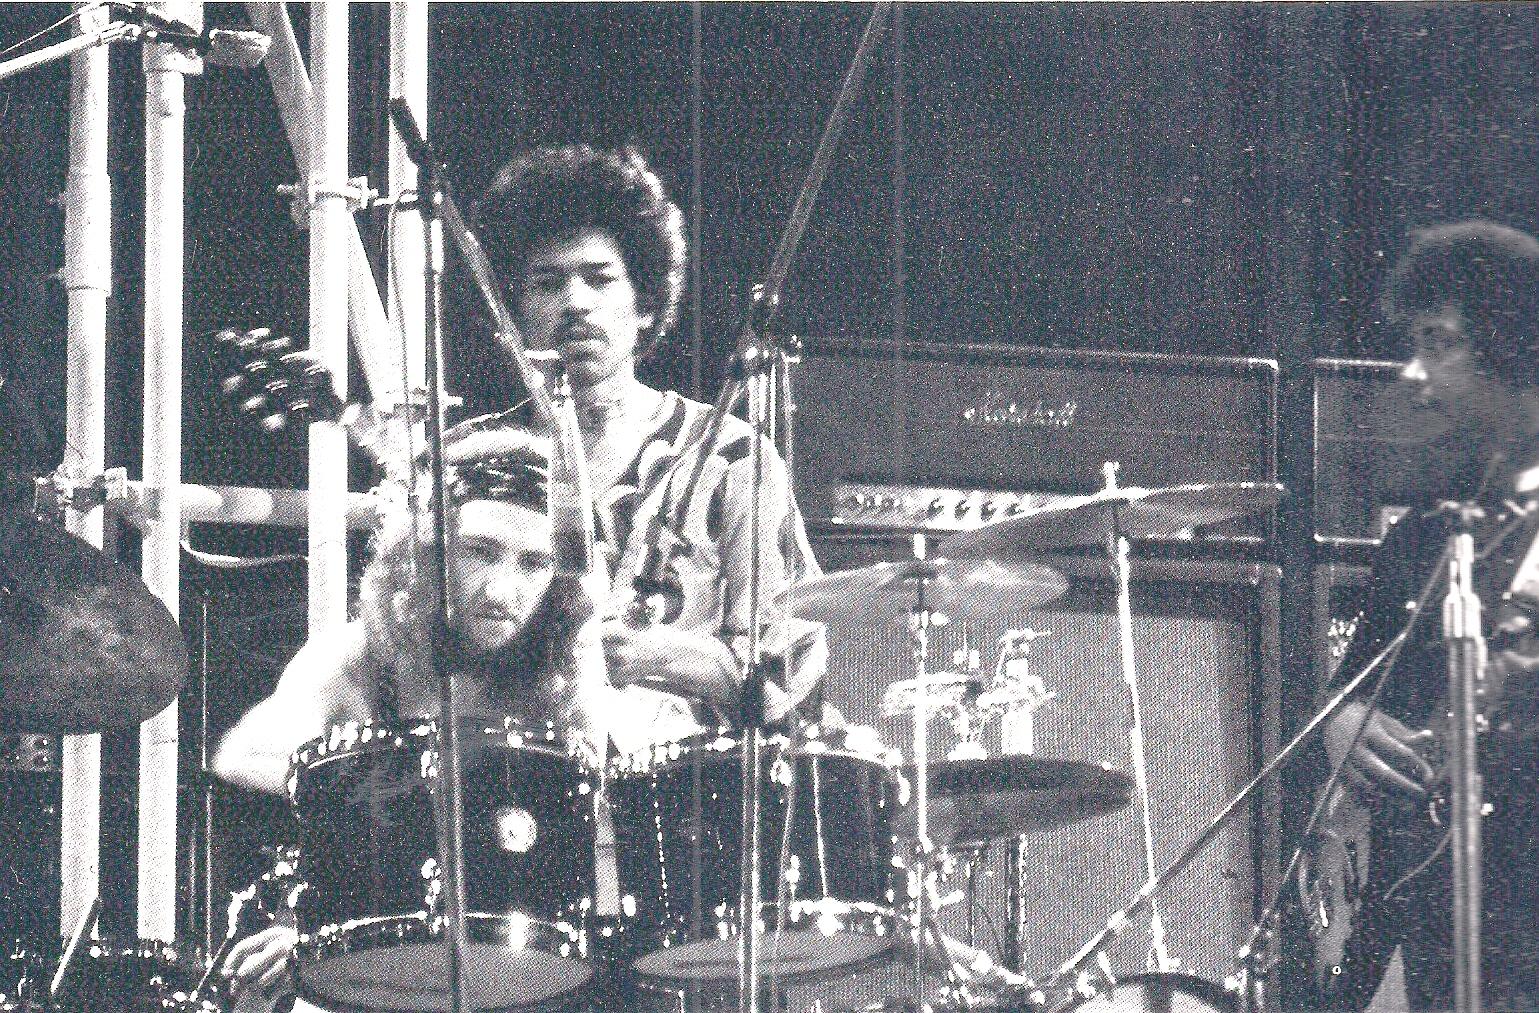 Blue Wild Angel: Jimi Hendrix Live At The Isle Of Wight (2002) - Page 2 91c9923bcf31924ddf0ad67acfdb289e